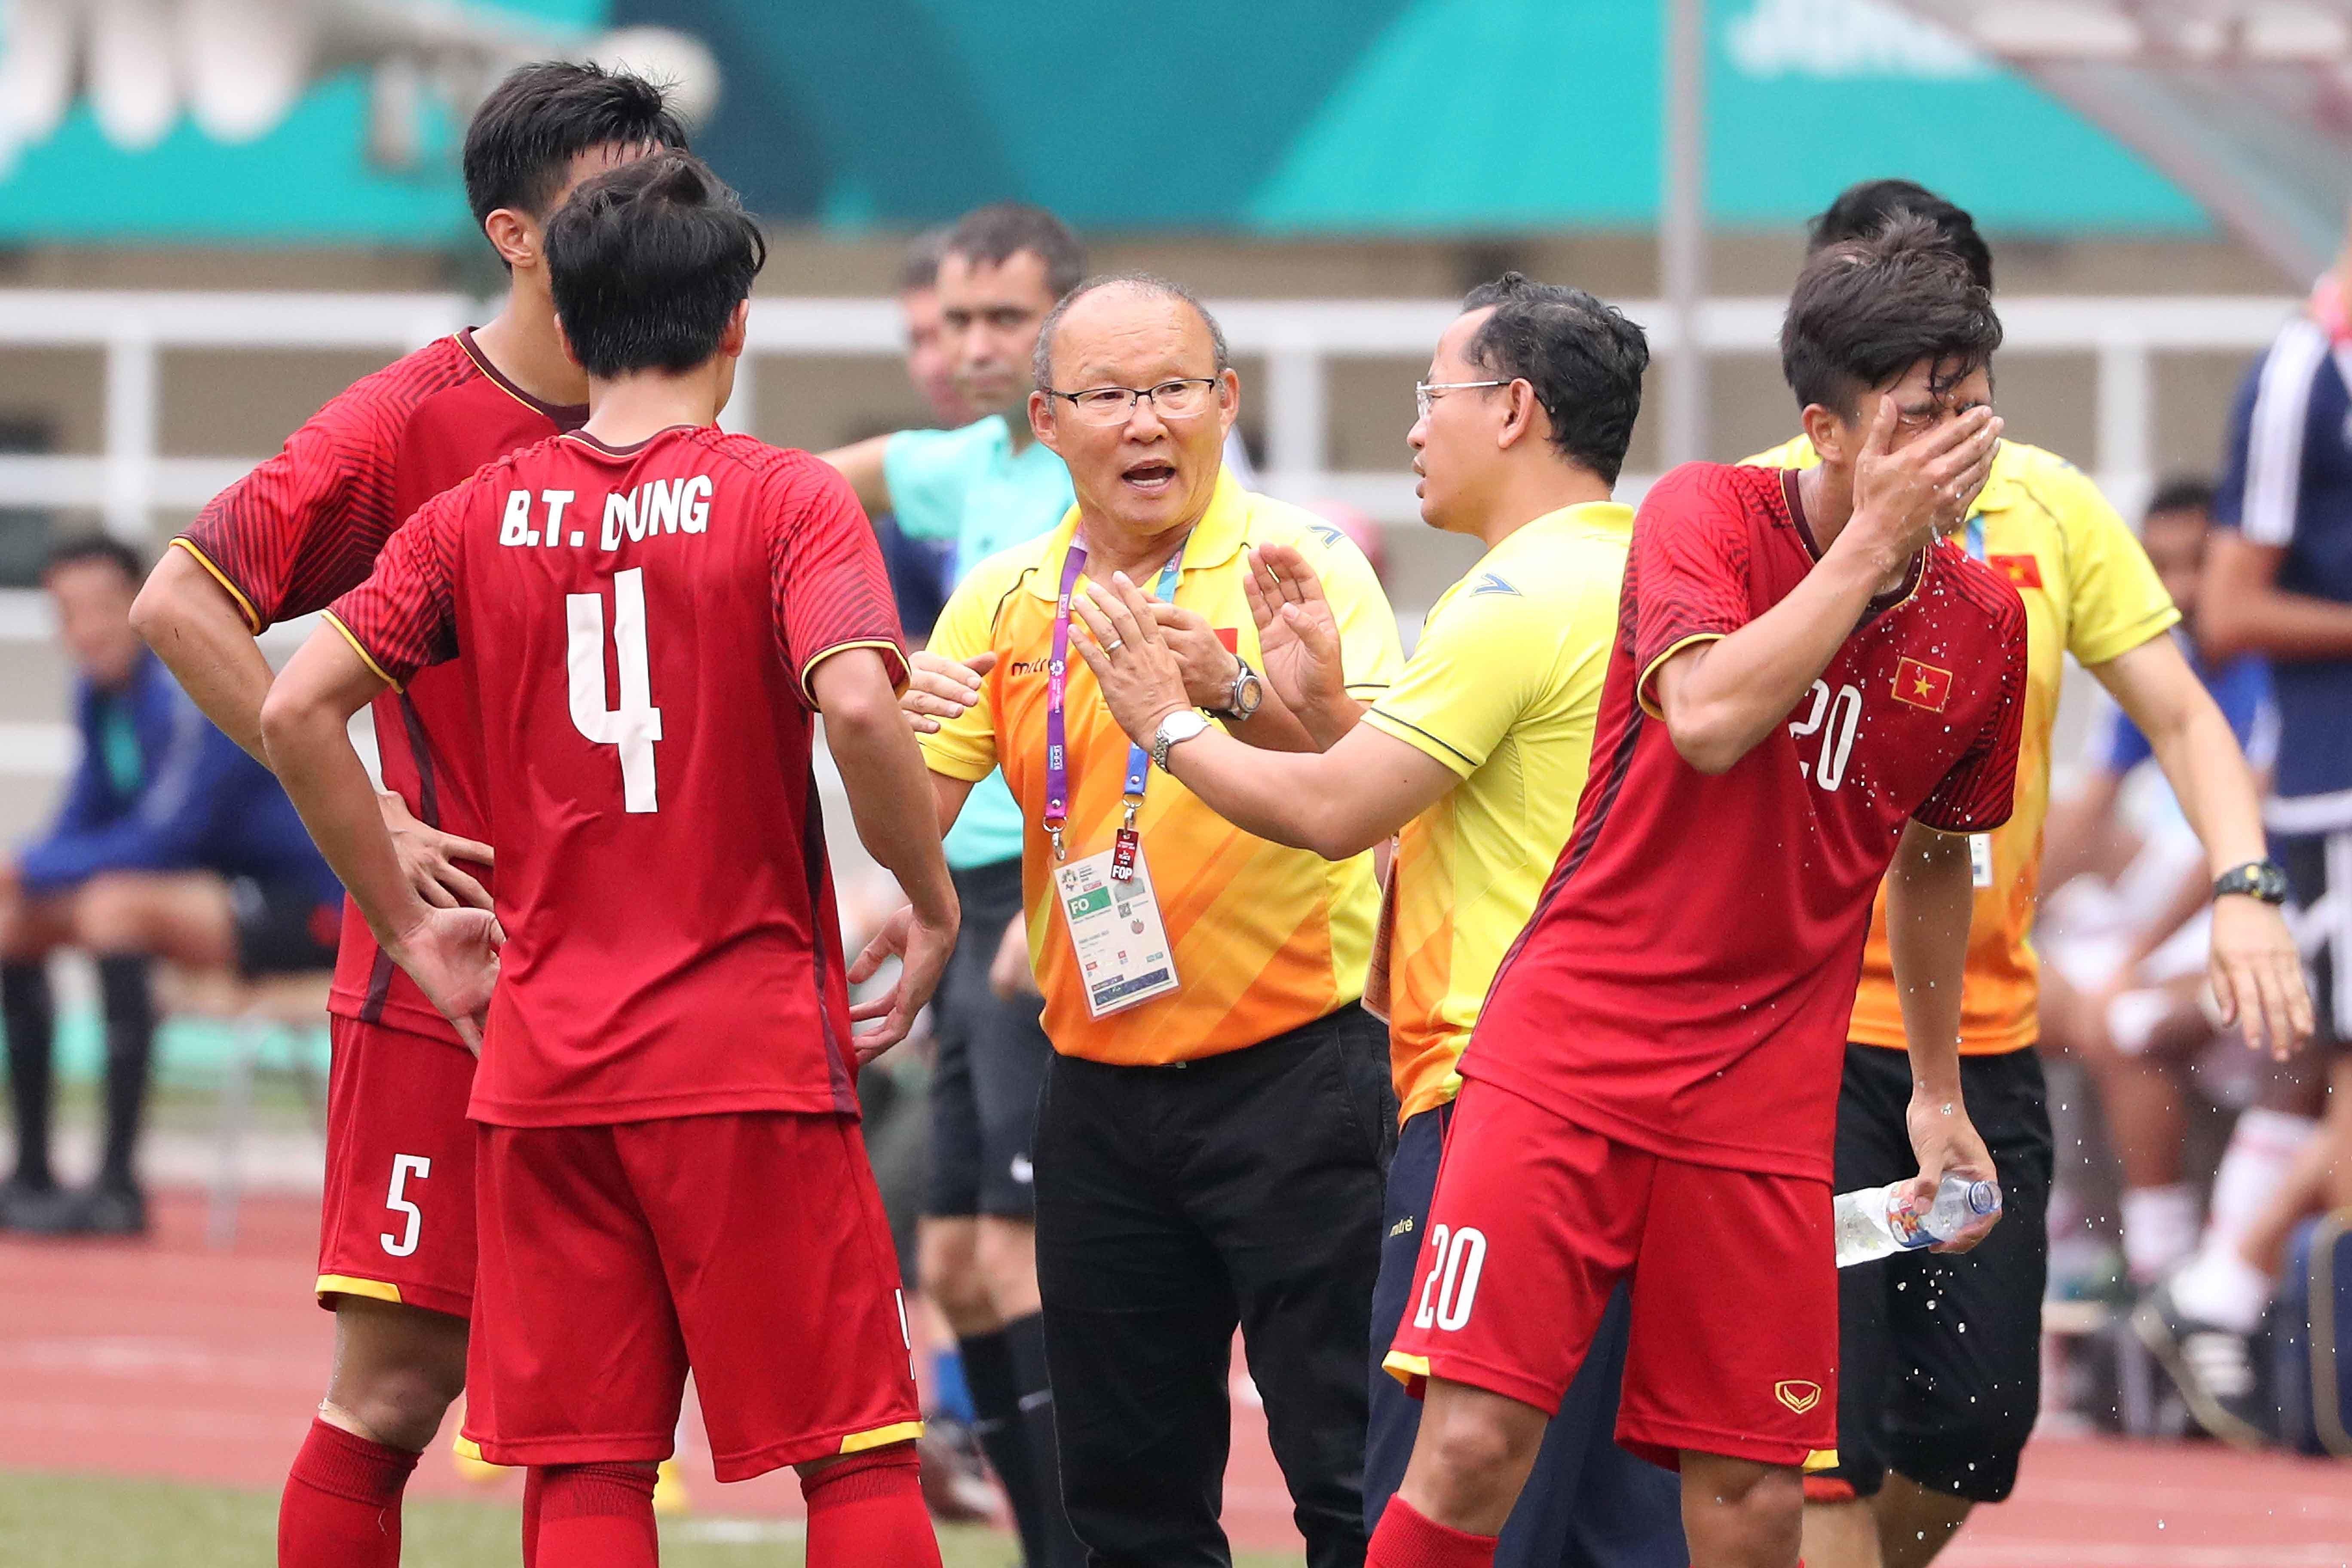 SBS가 15일 밤 베트남-말레이시아 결승전을